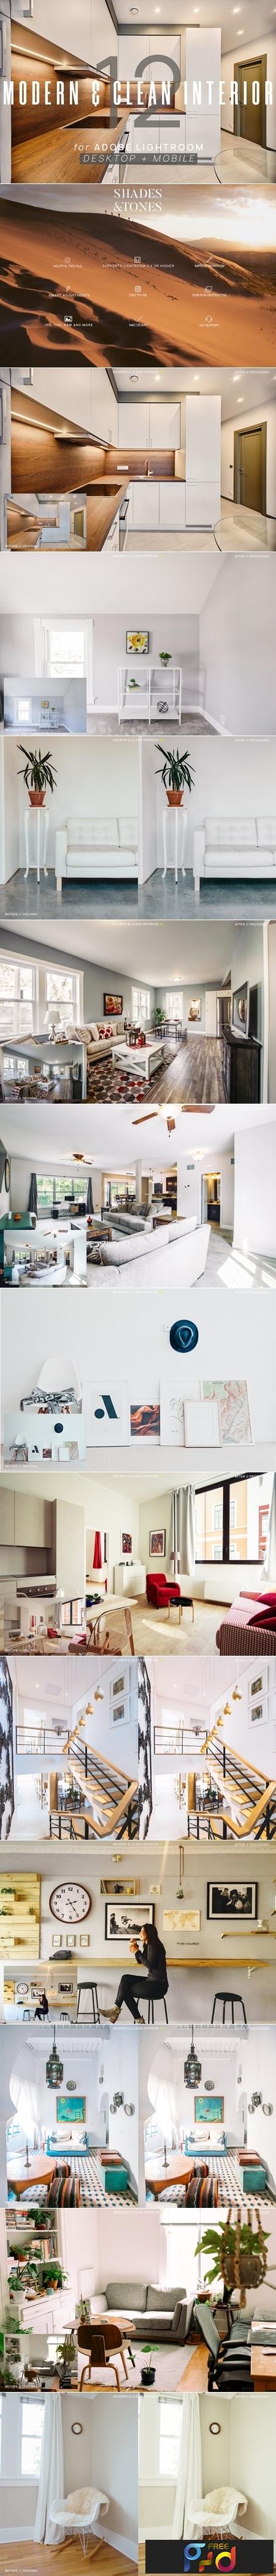 12 Modern Interior Presets + Mobile 3479039 1